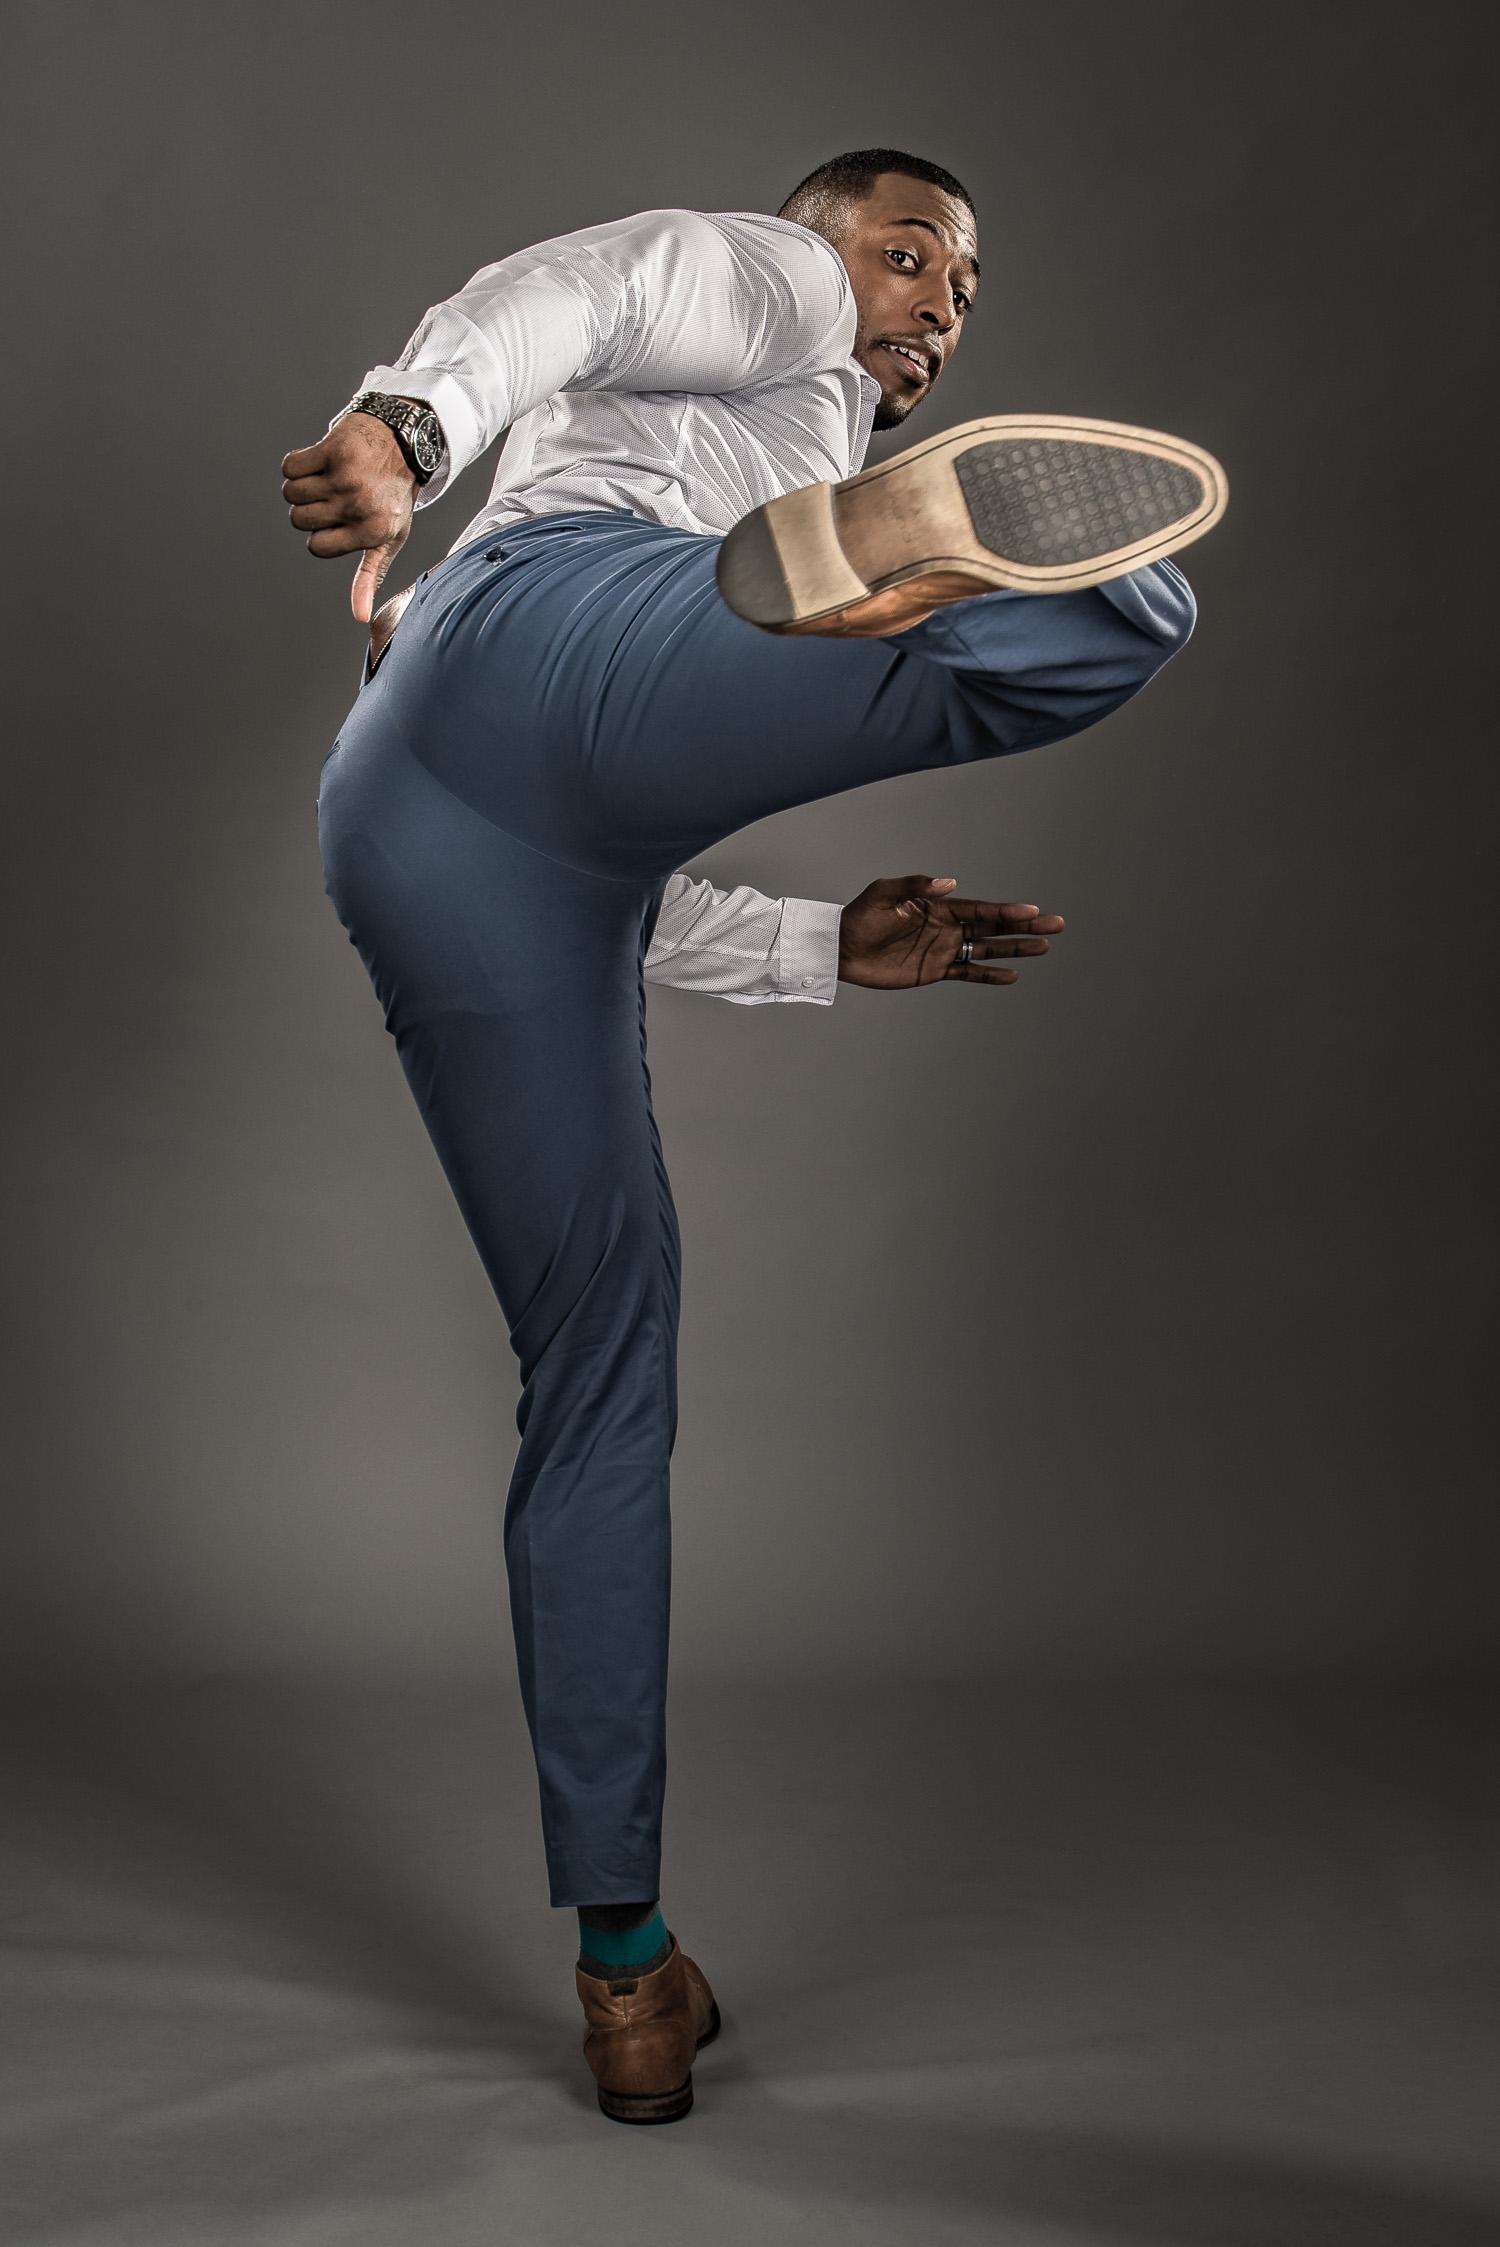 Portrait of Actor Model Kicking